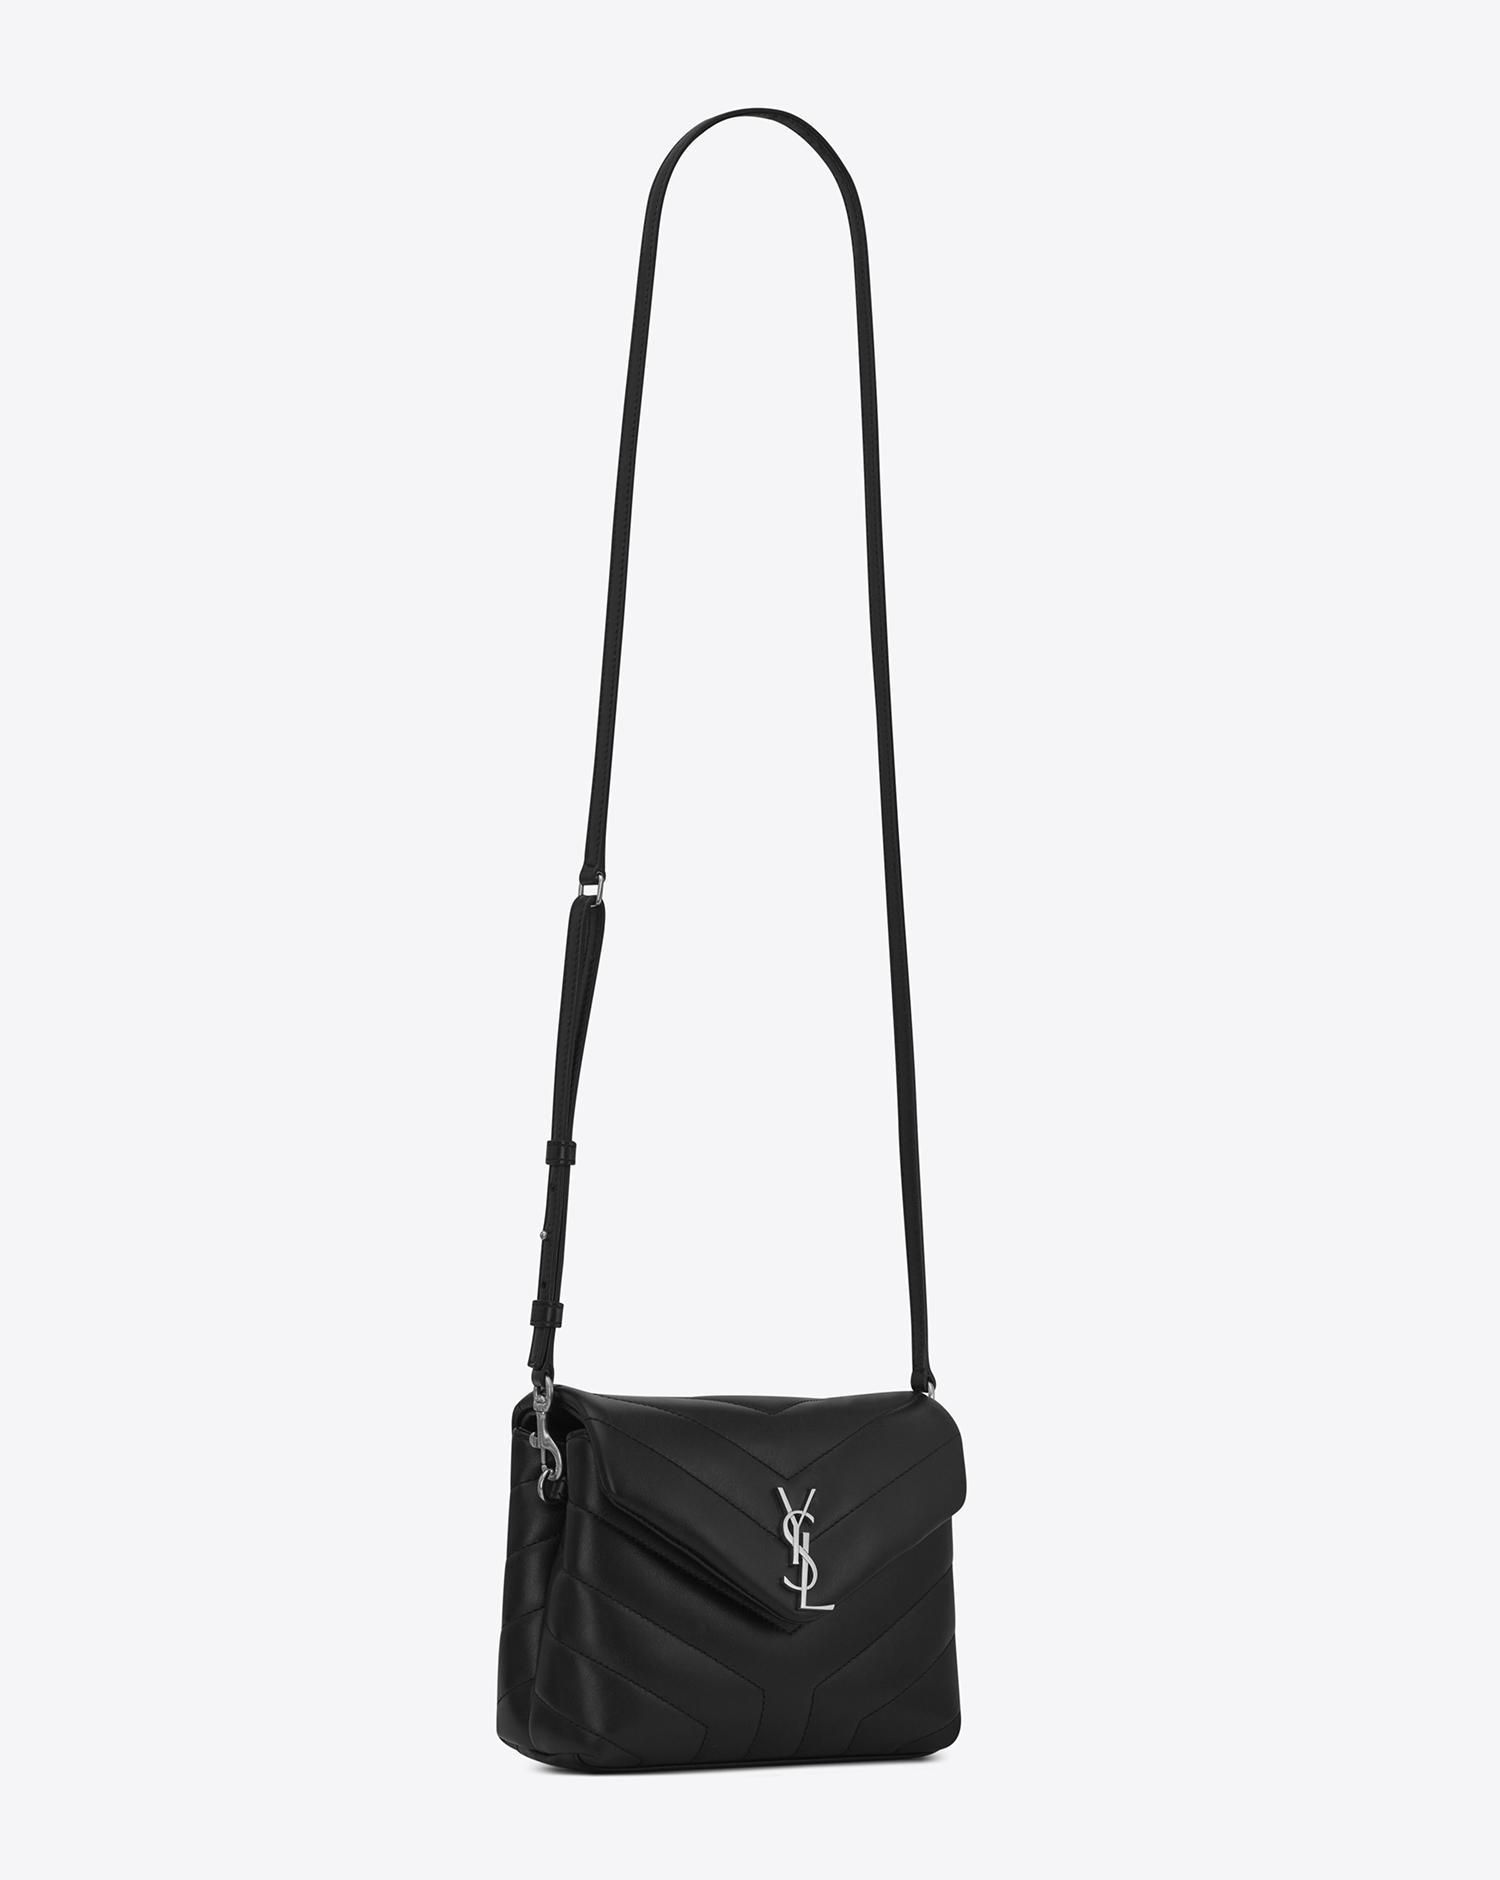 a30a4bdca083 Saint Laurent Toy Loulou Strap Bag in Black - Lyst